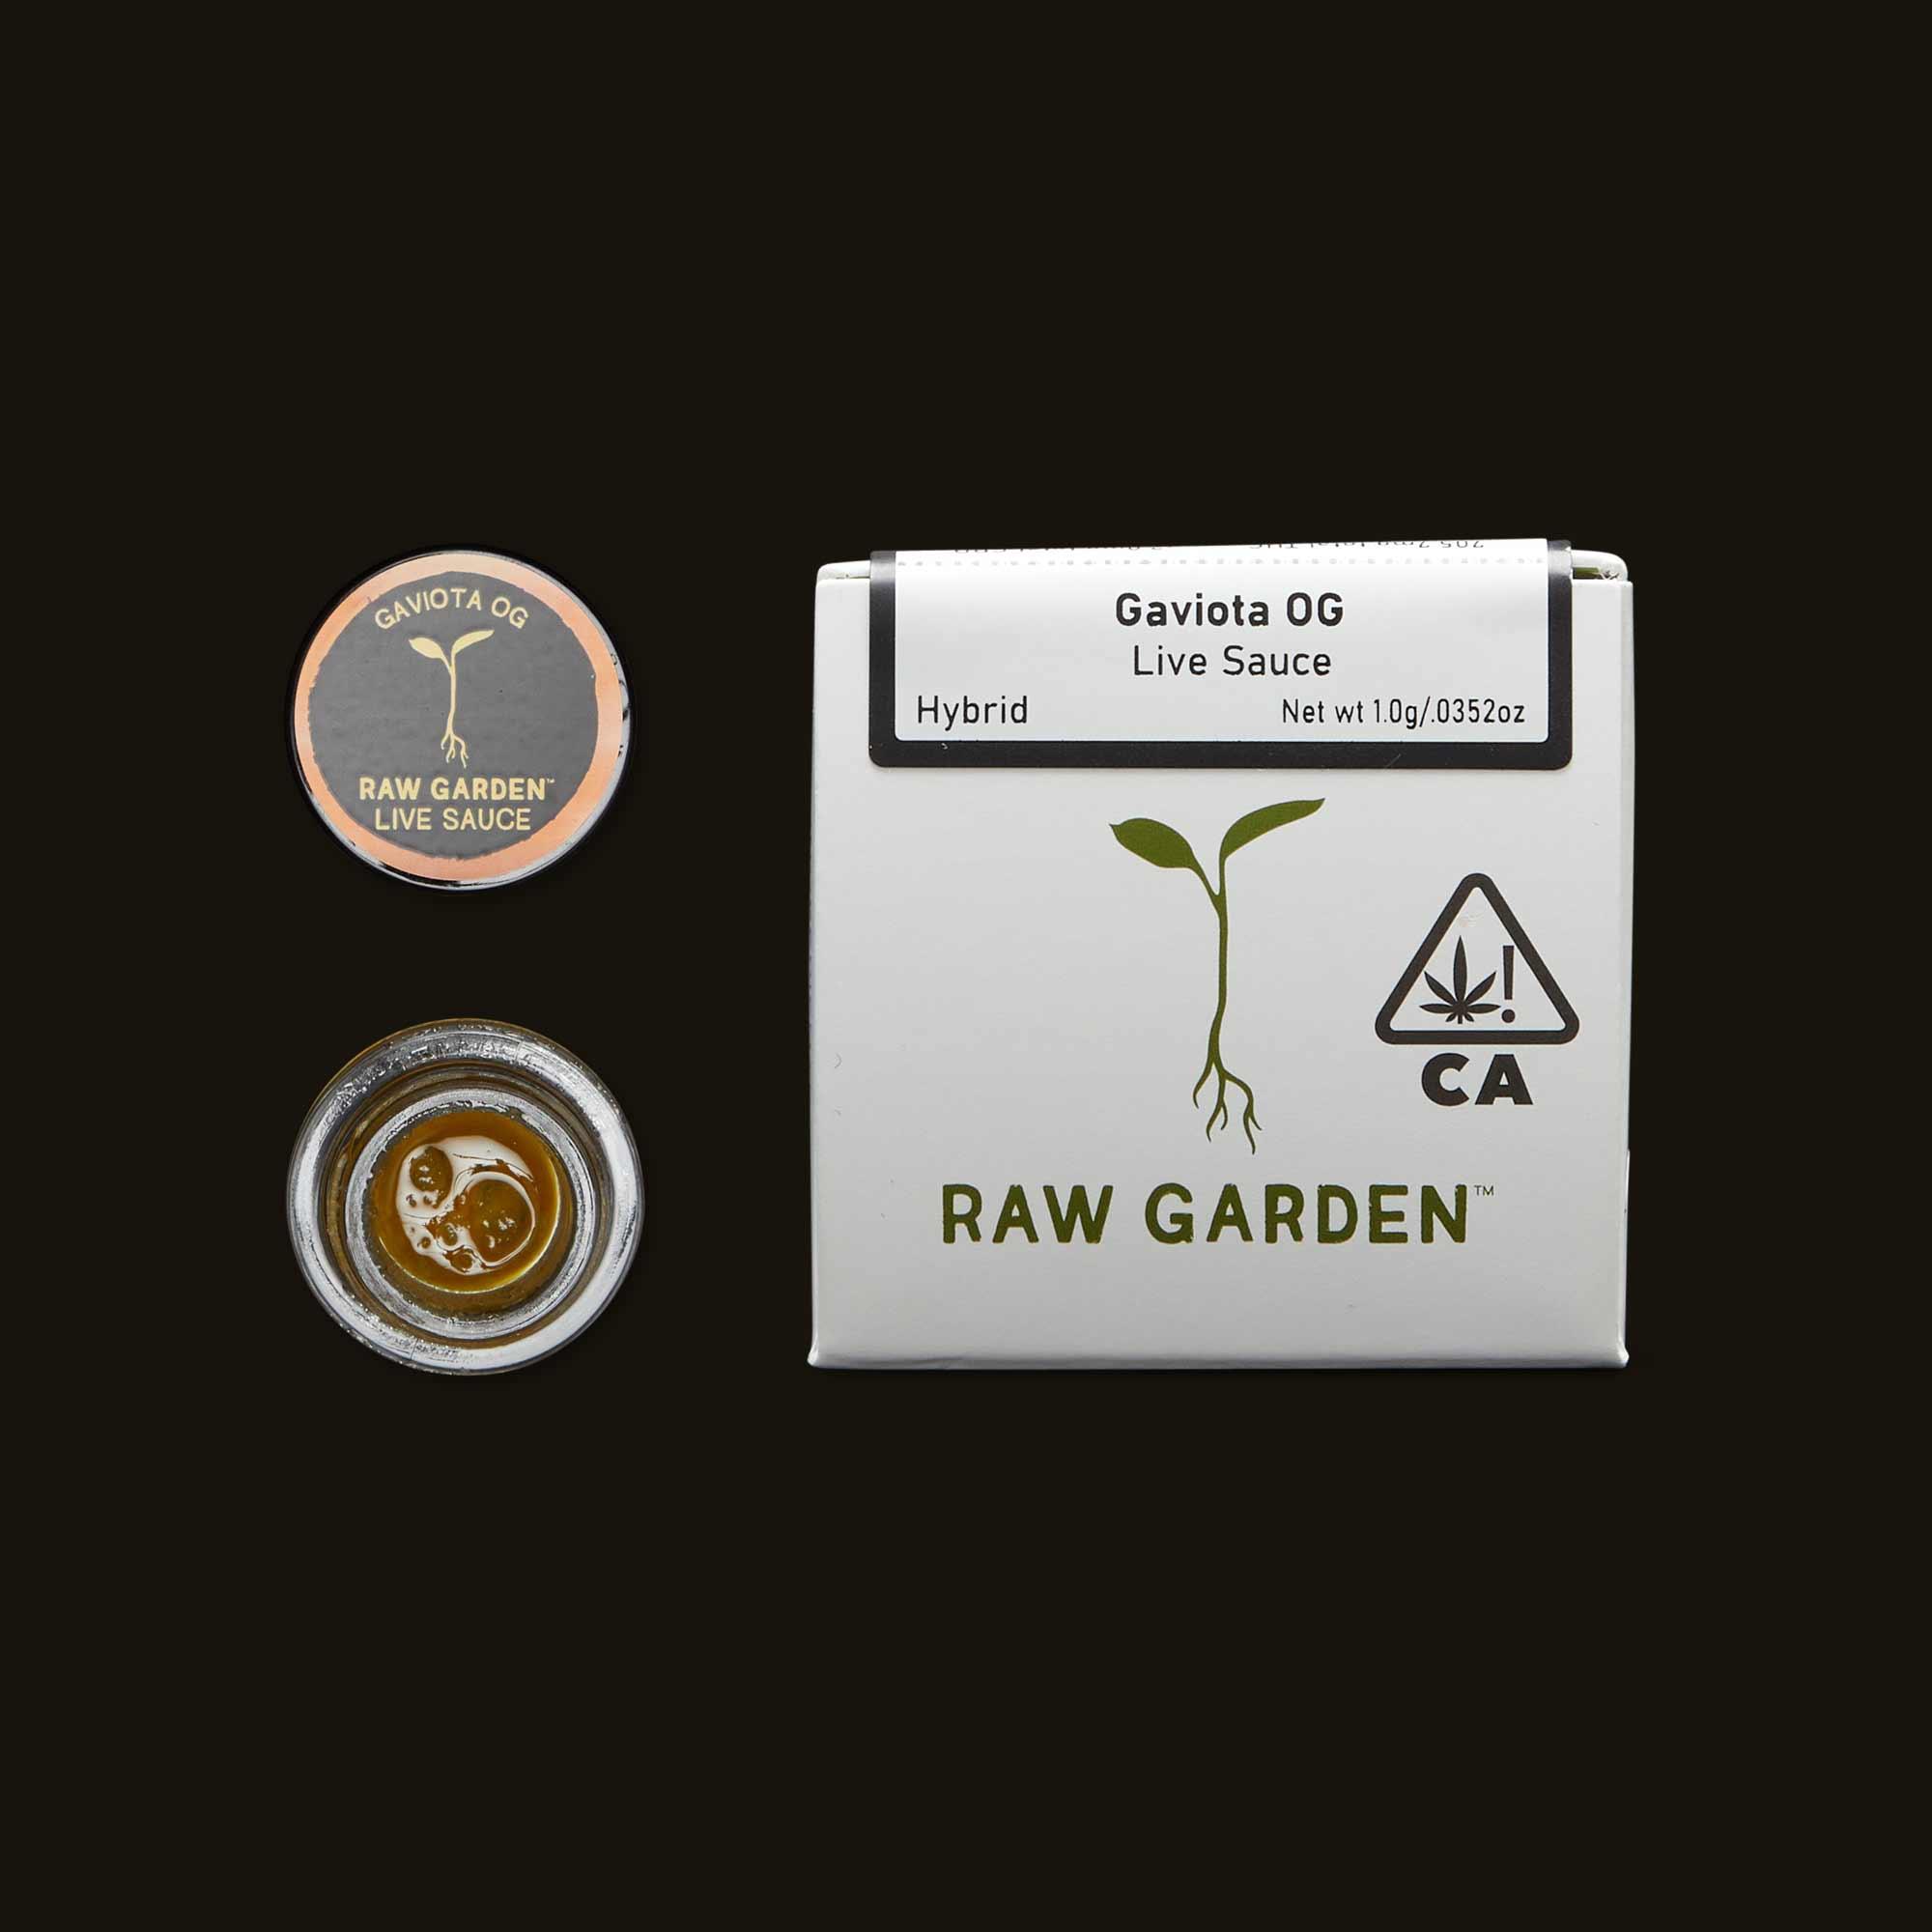 Raw Garden Gaviota OG Live Sauce